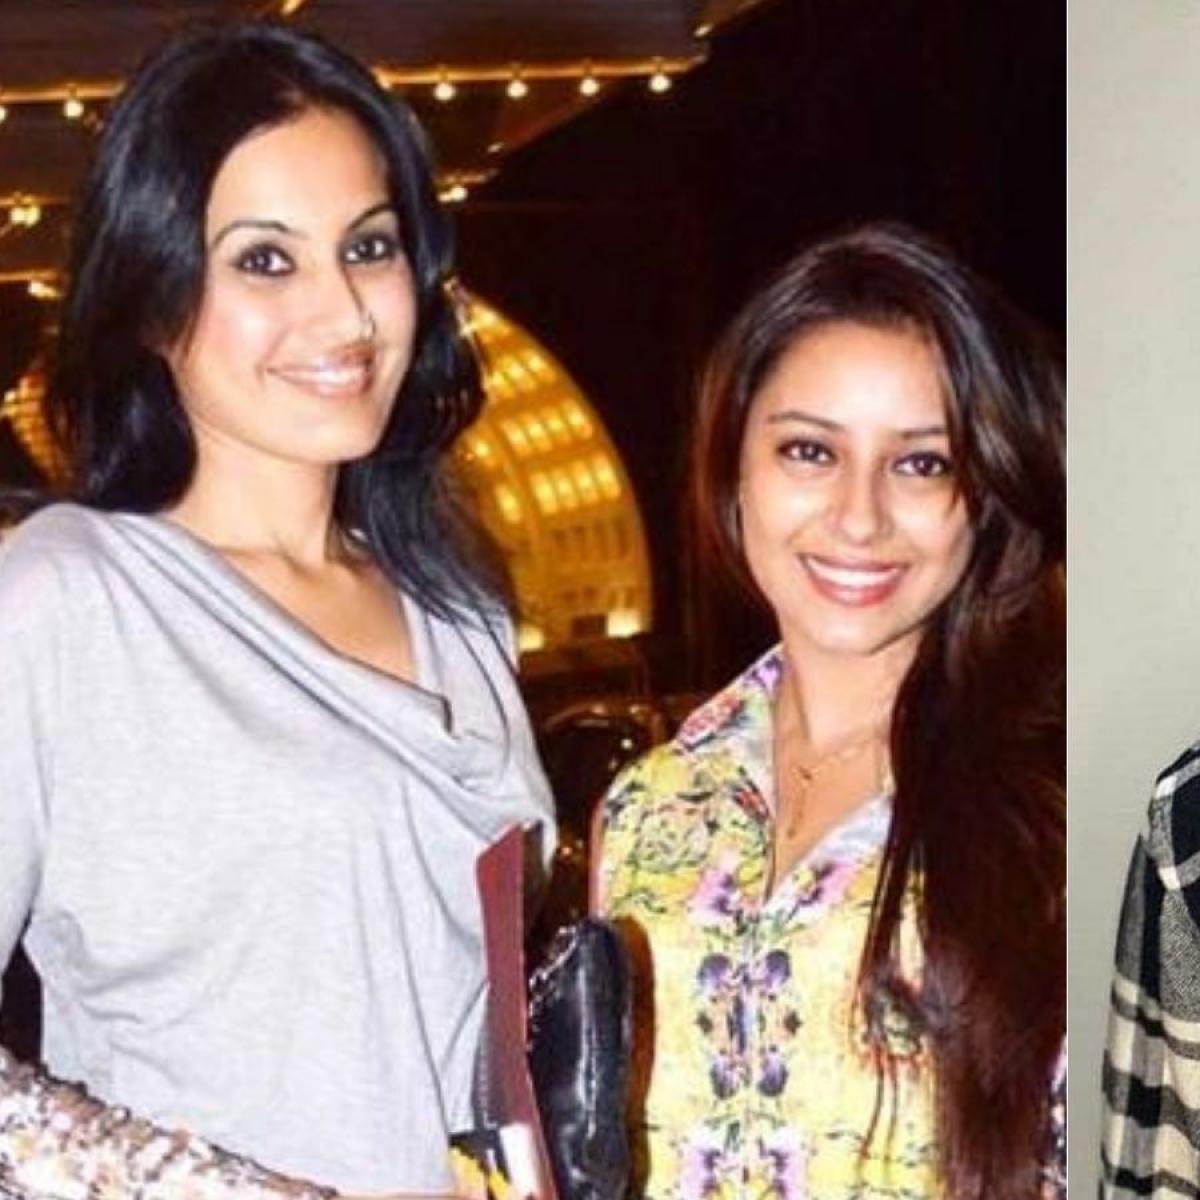 'Fame chahiye?': Kamya Punjabi slams Vikas Gupta for claiming he dated late actress Pratyusha Banerjee